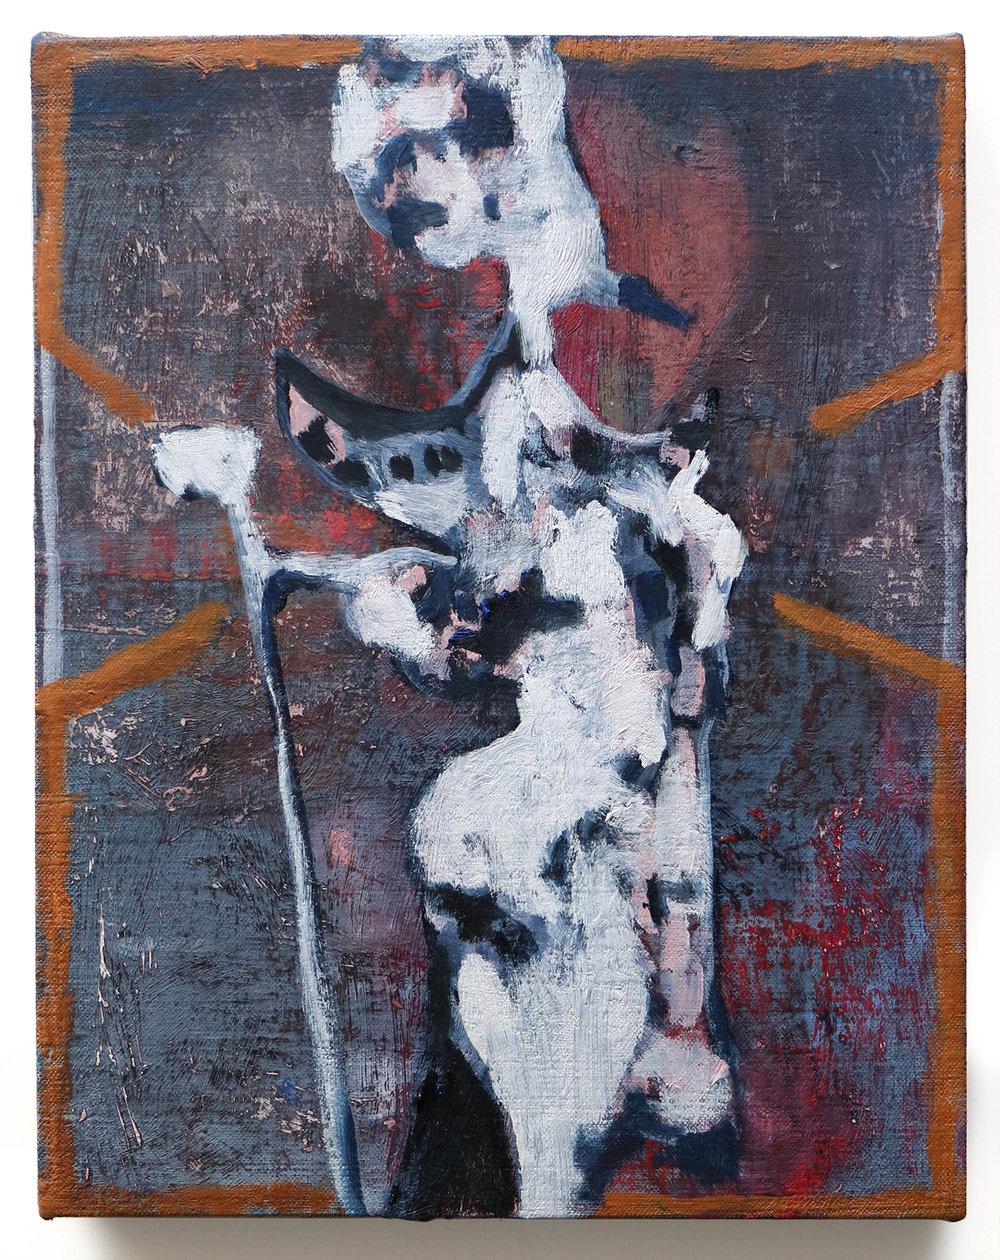 Lumin Wakoa, solitary, 2018, Oil on linen,14 x 11 in